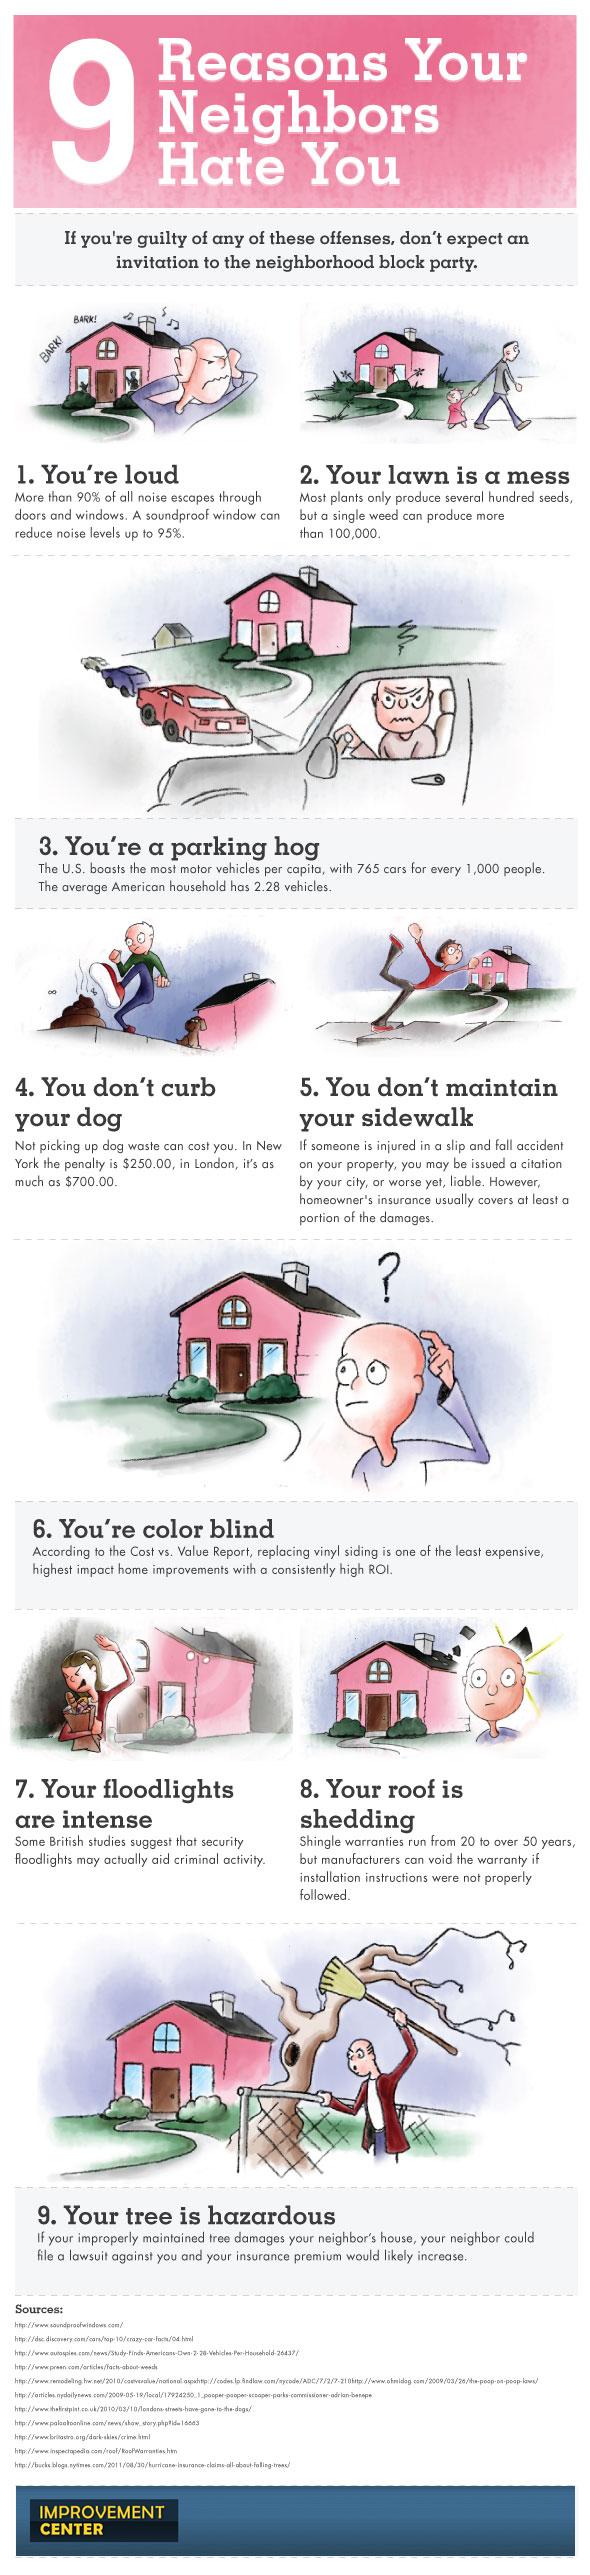 9 reasons neighbors hate you